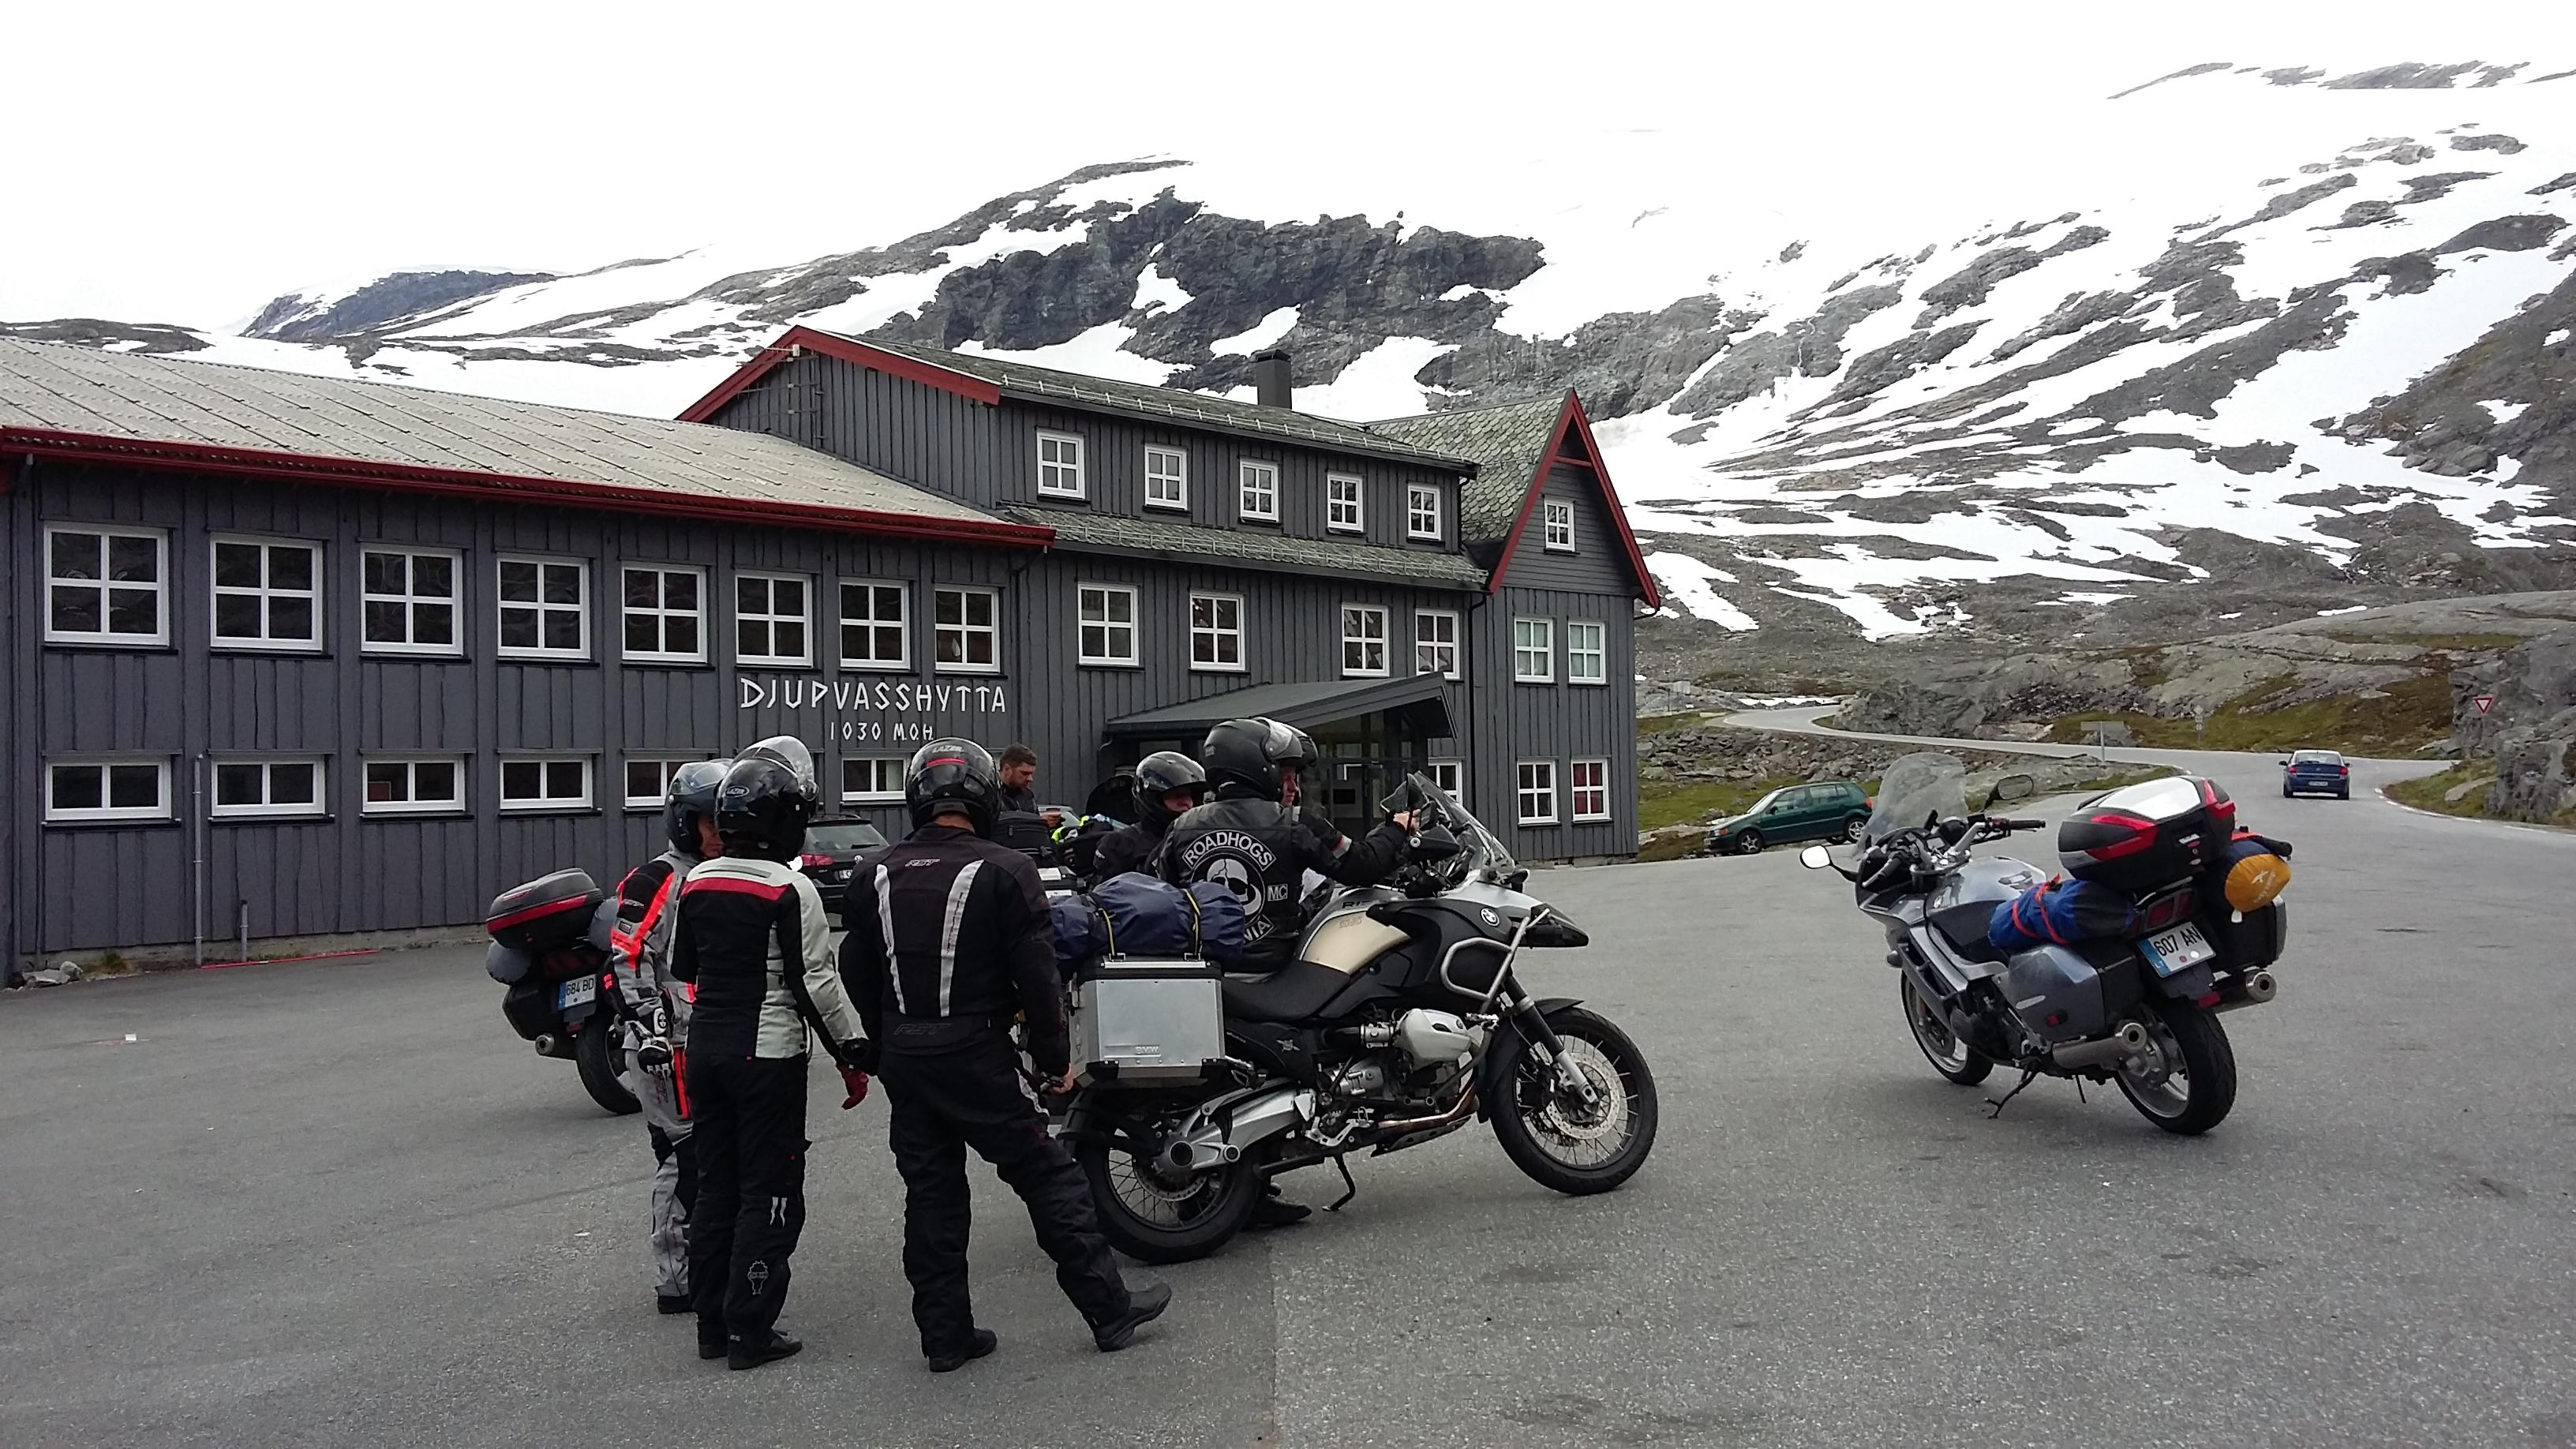 volvos.lt/images/Publikavimui/Norge/20160704_172430.jpg